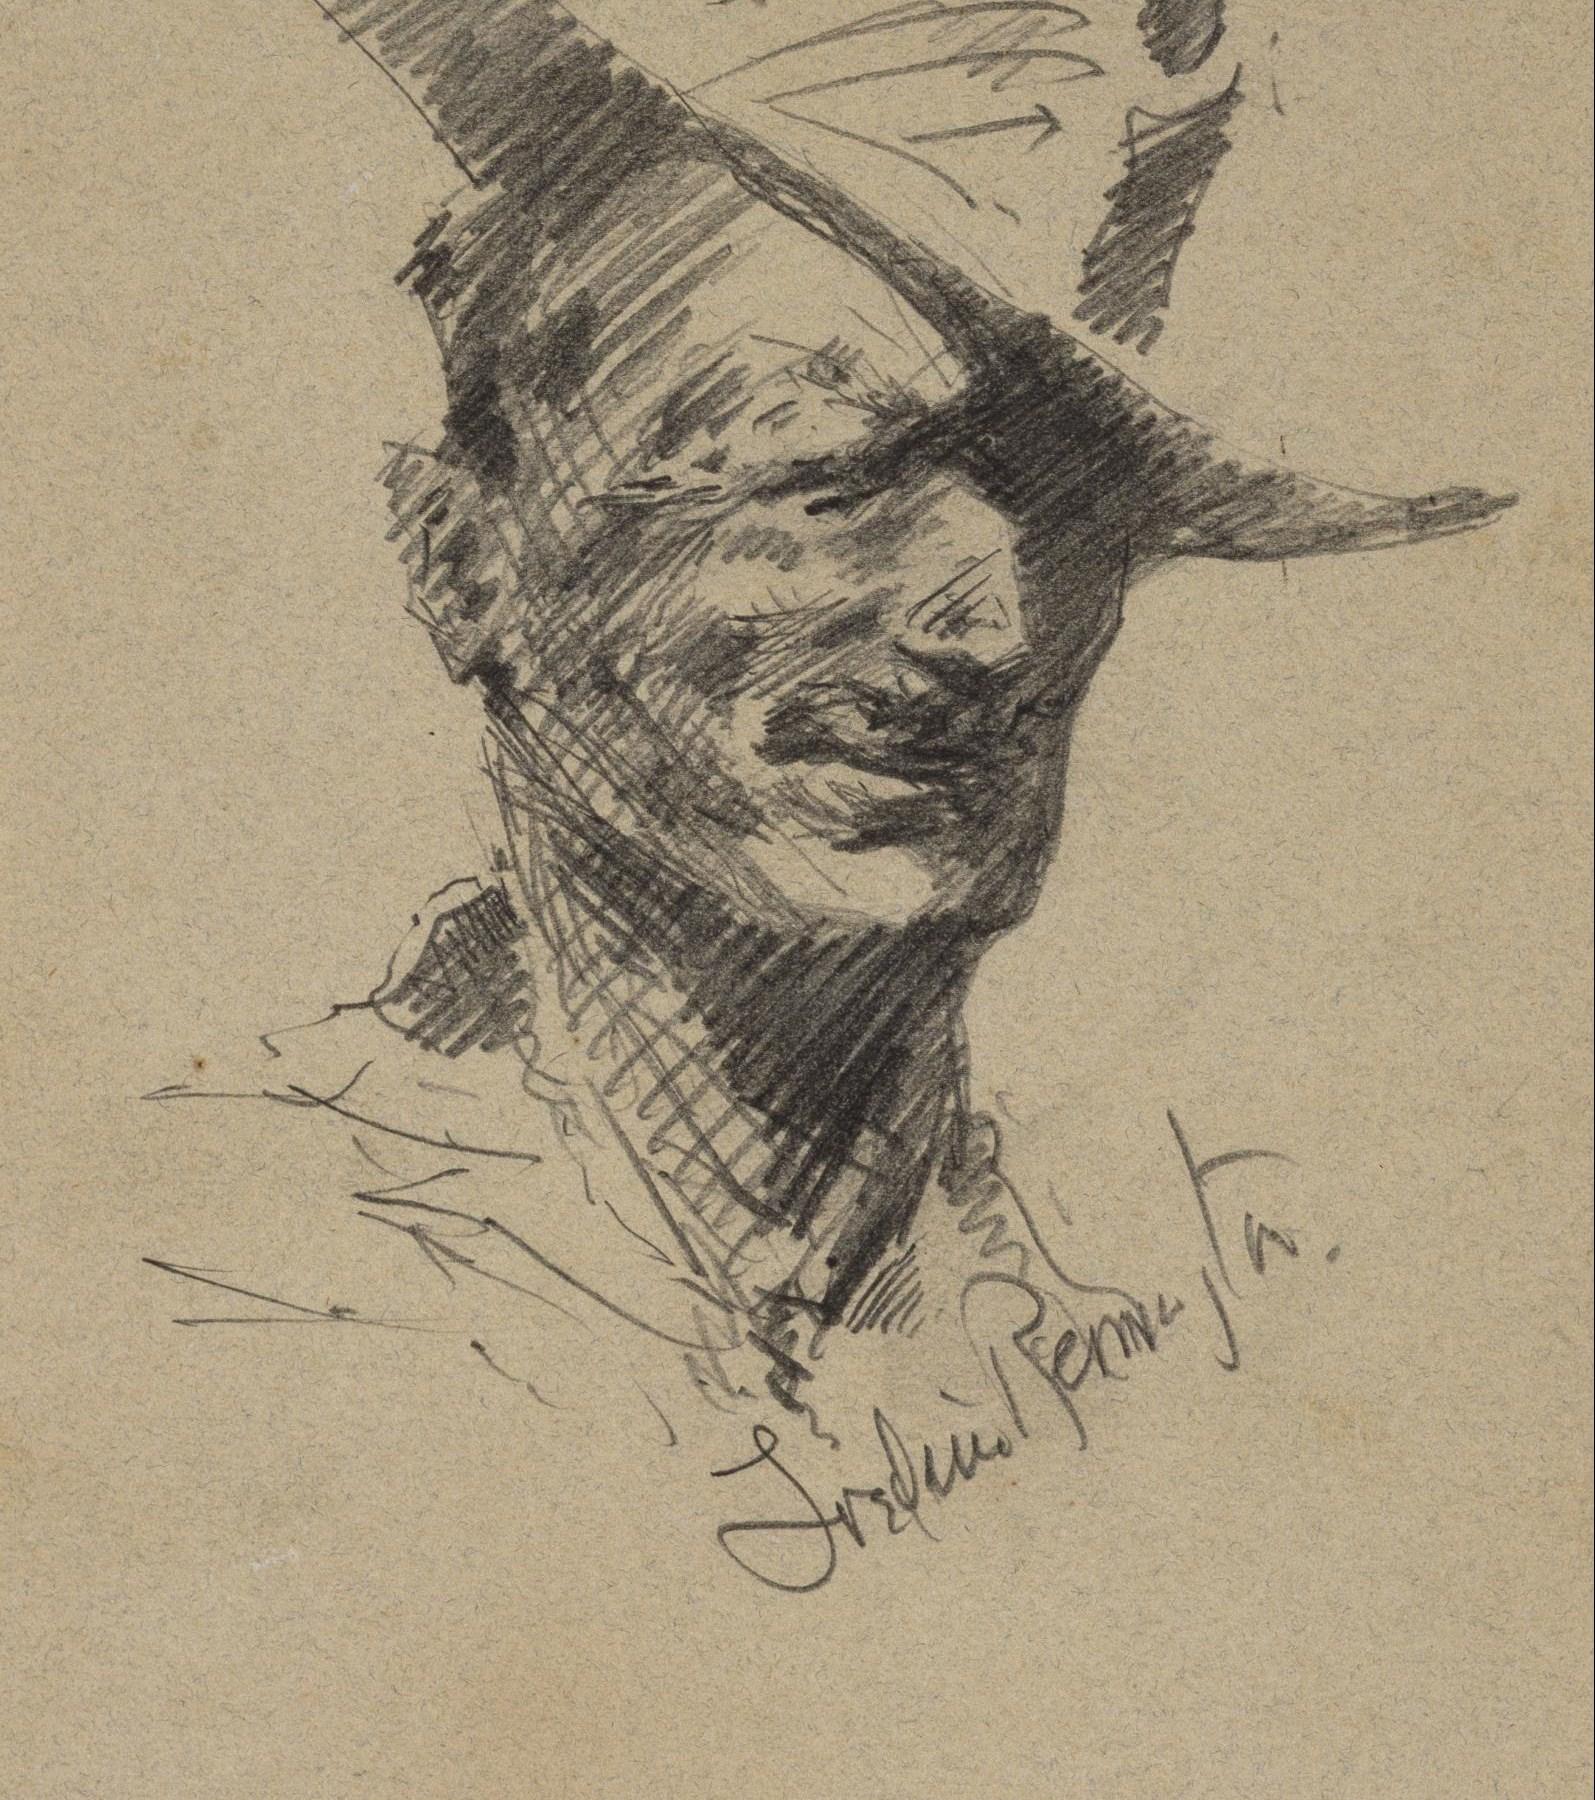 Frederick Remington, Self Portrait